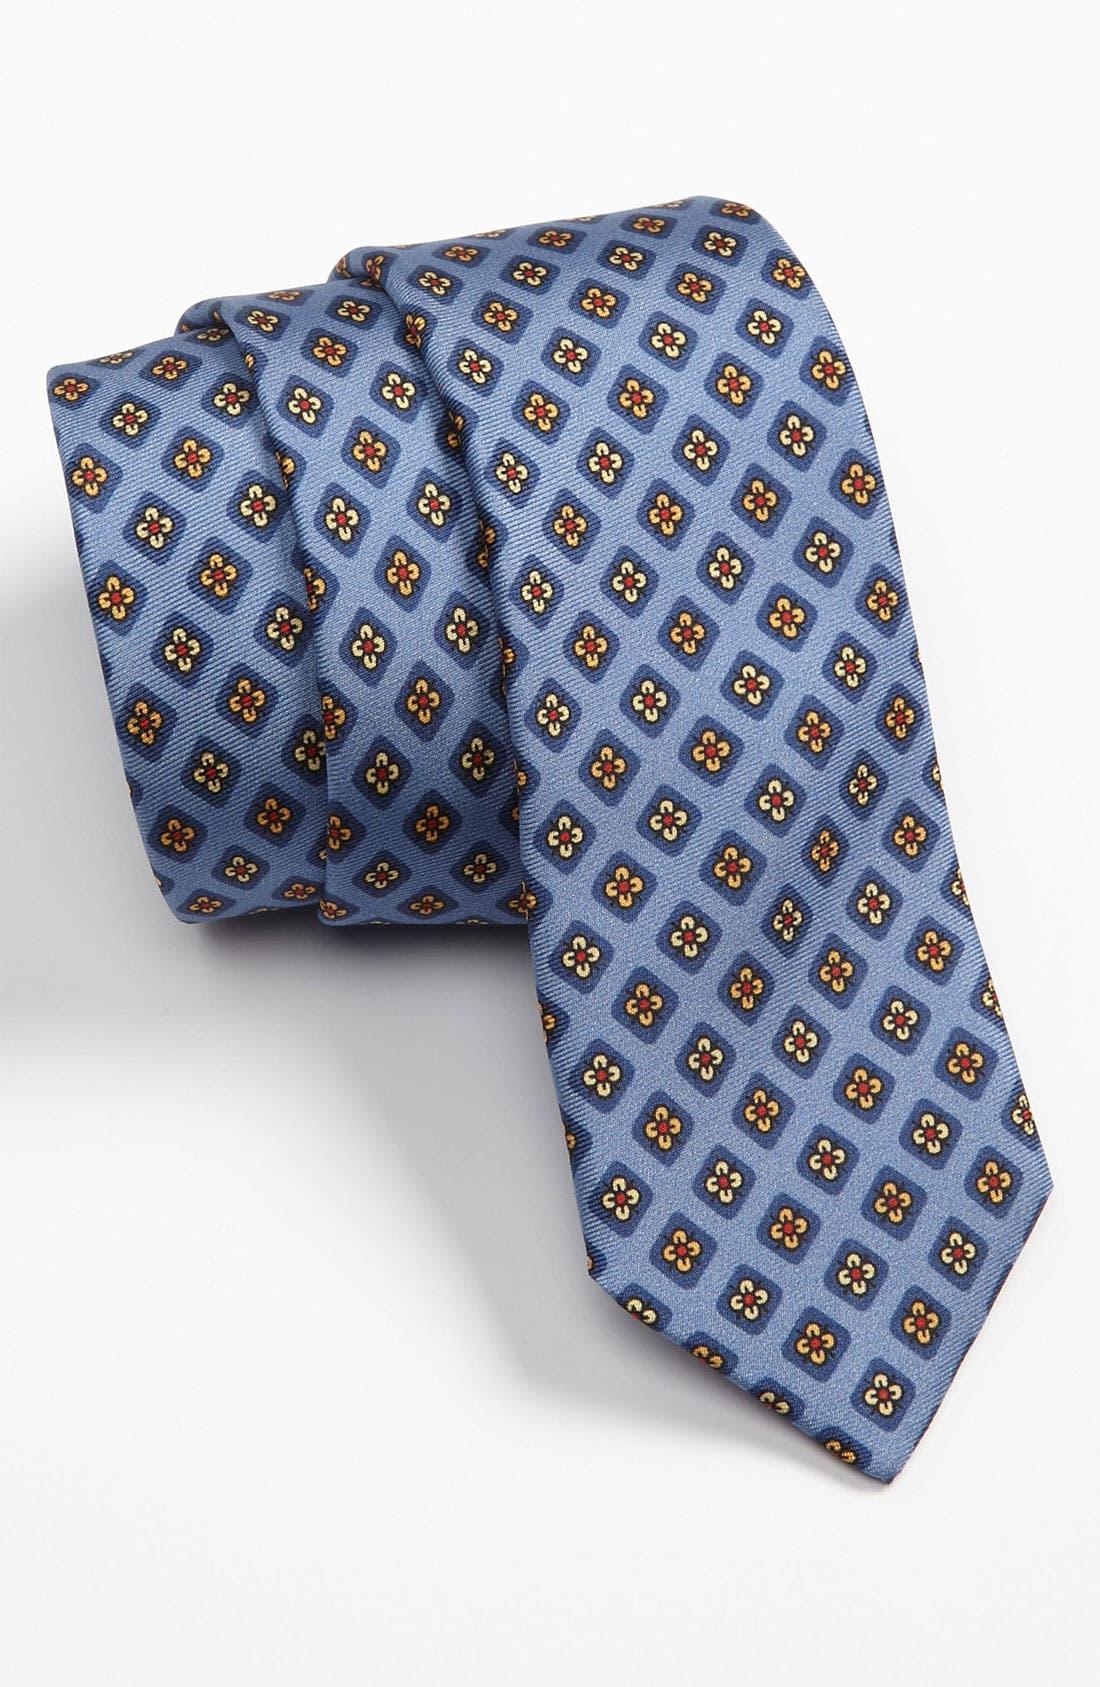 Alternate Image 1 Selected - David Hart Woven Silk Tie